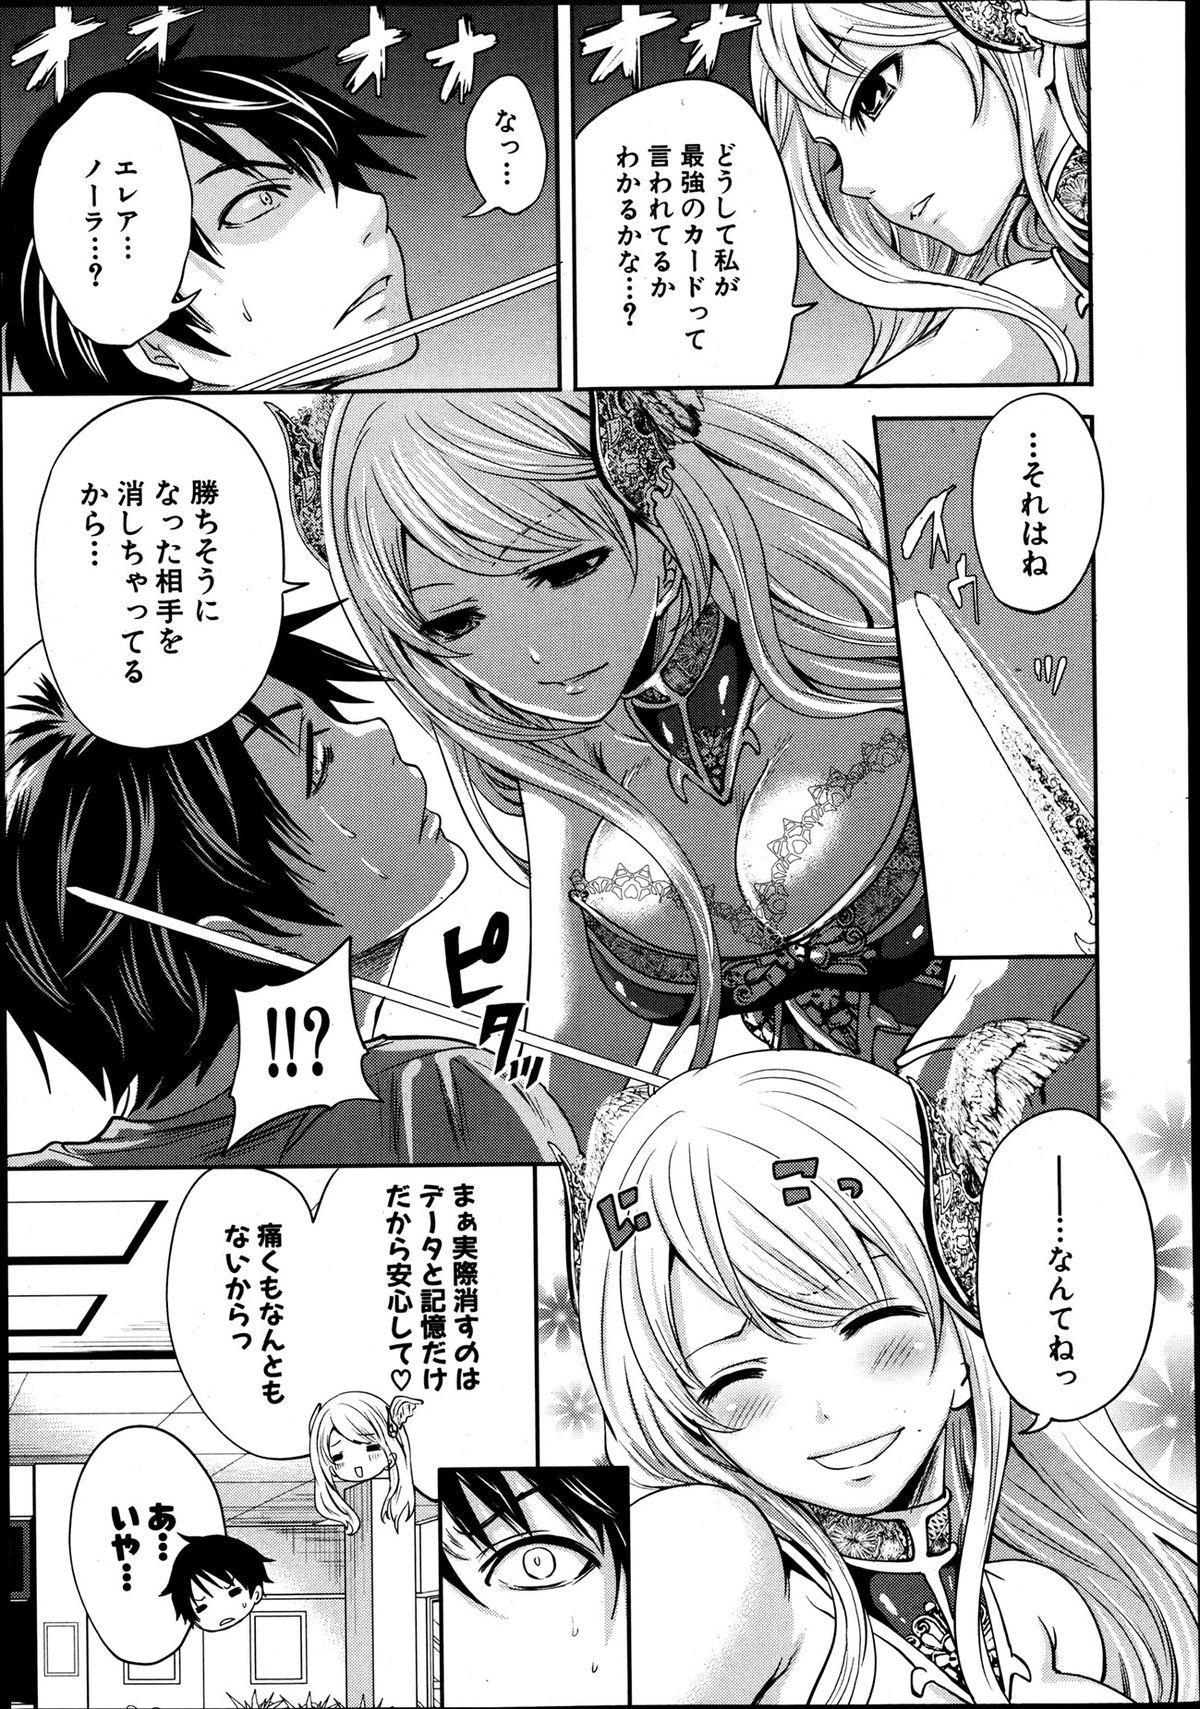 Kaishin no Eleanora Ch. 1-5 7